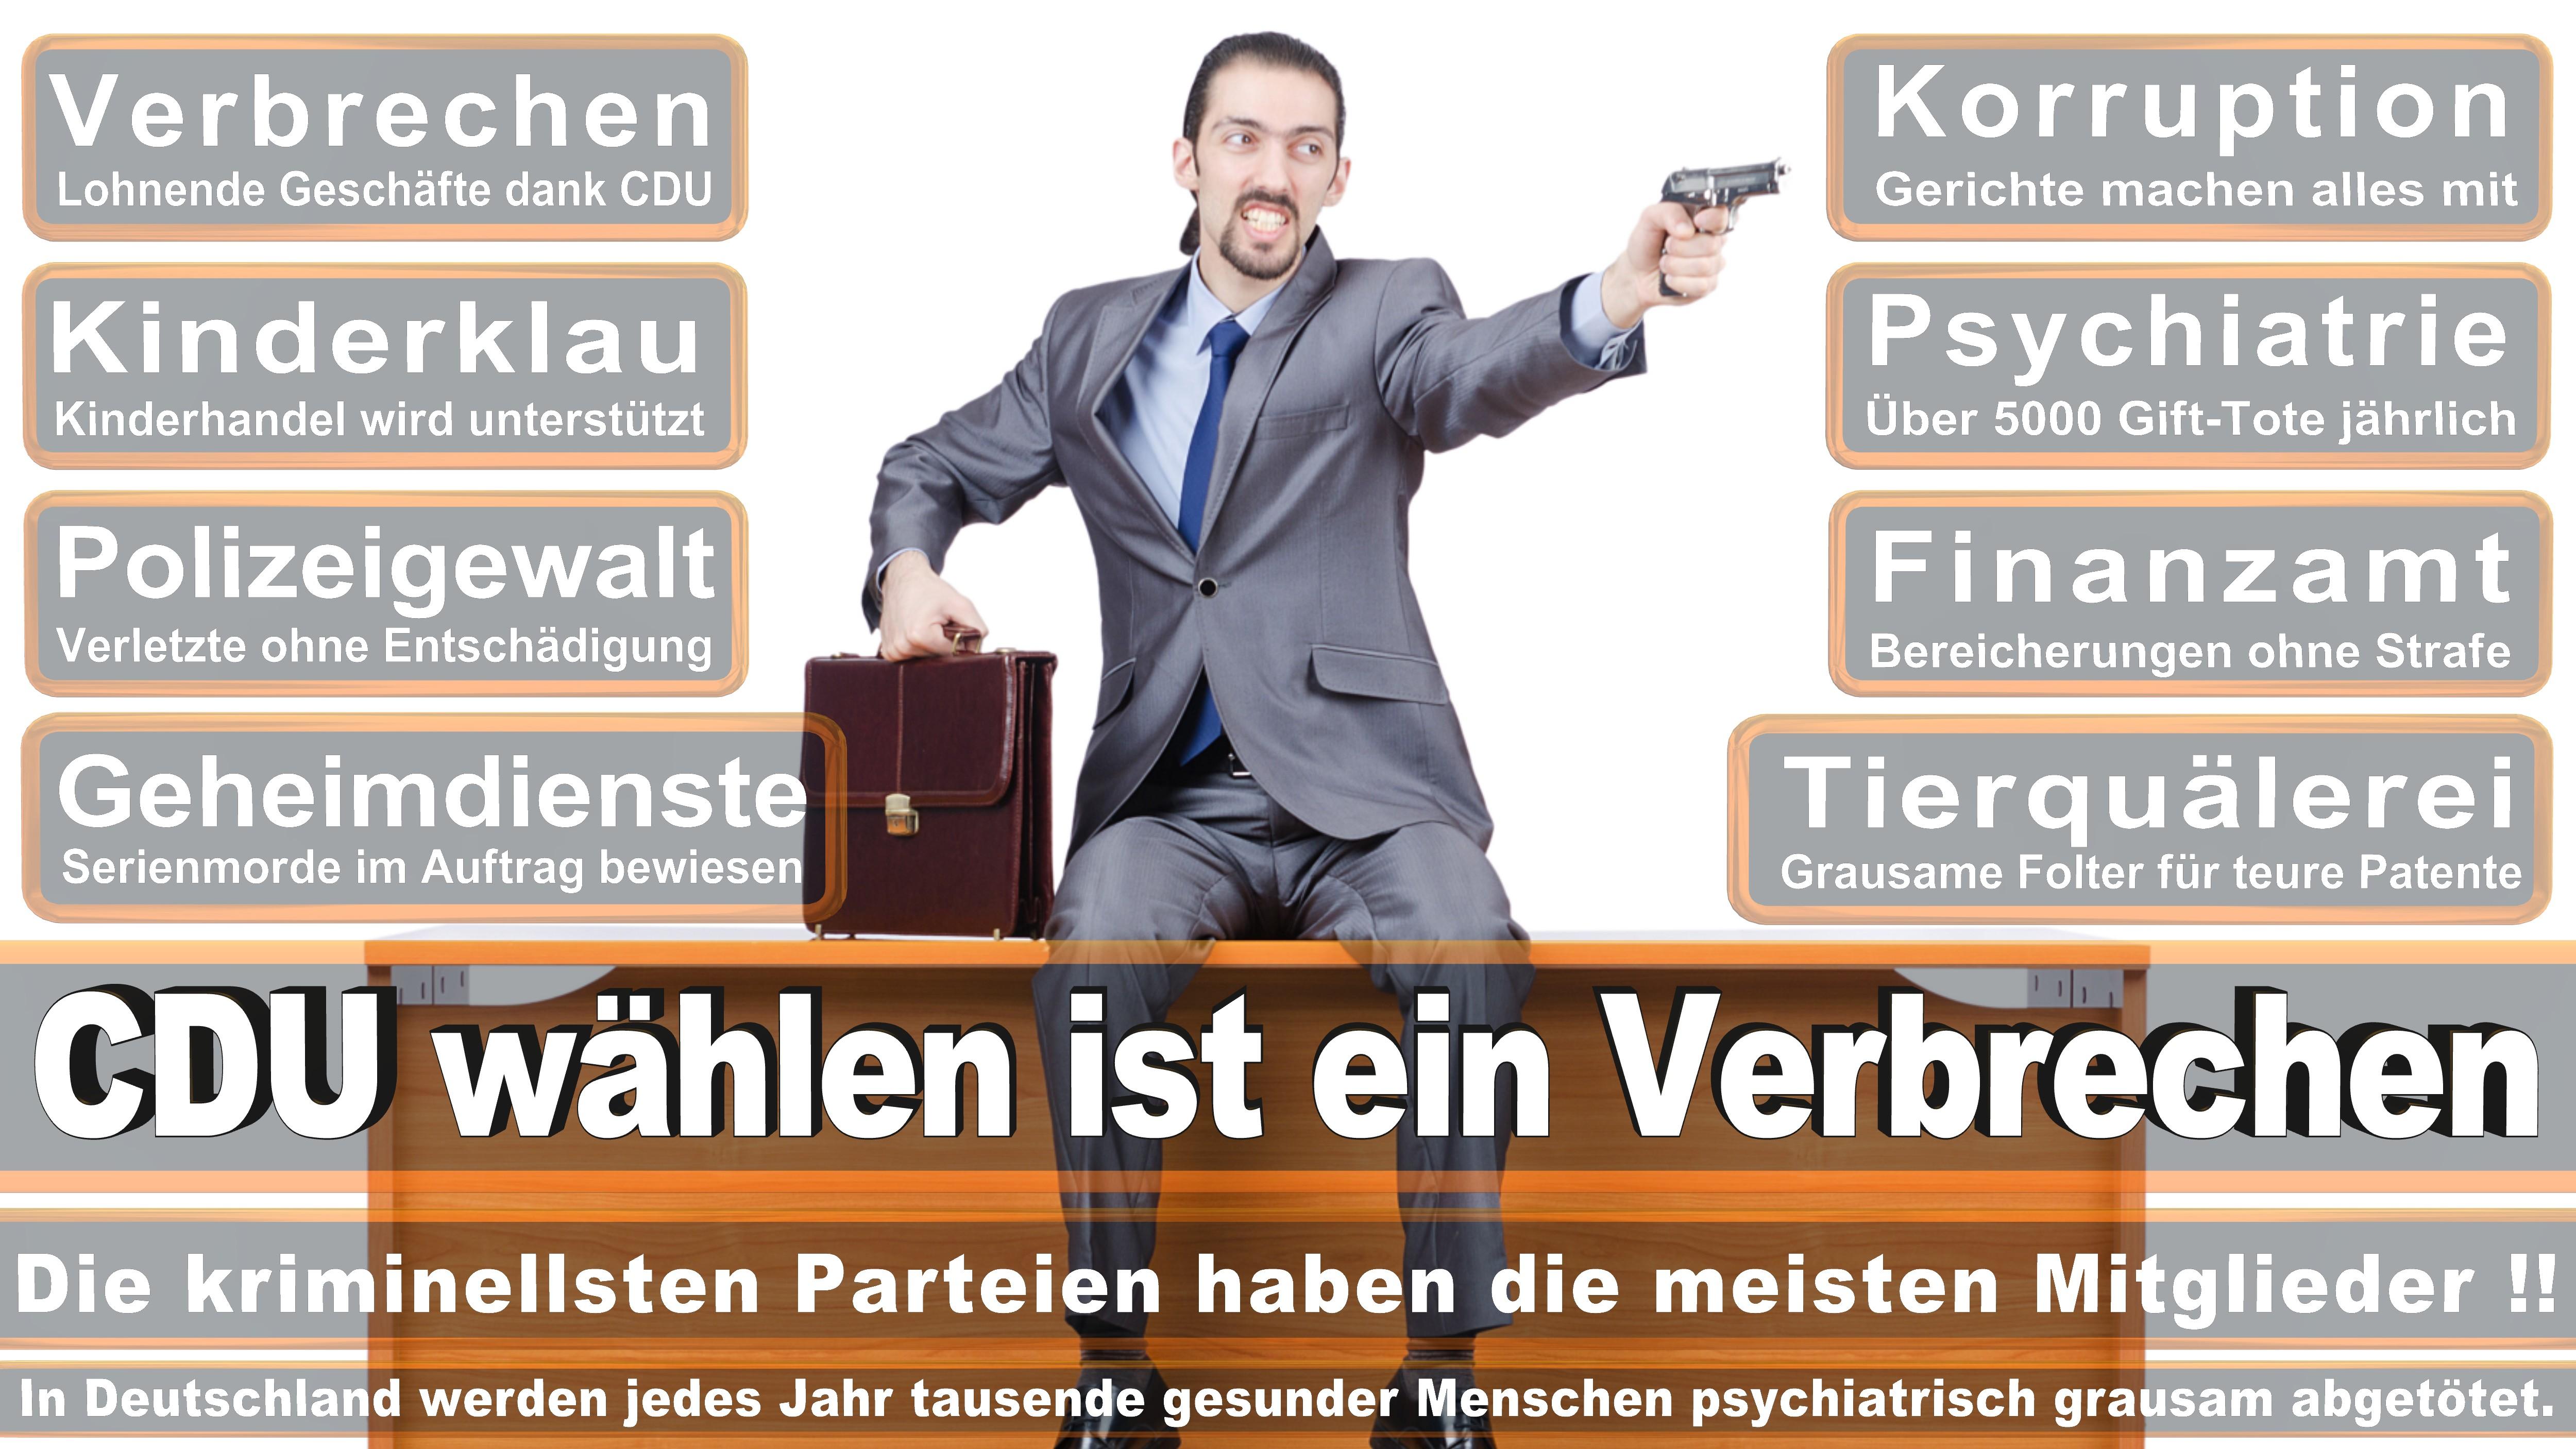 Mechthild Heil CDU CSU Politiker